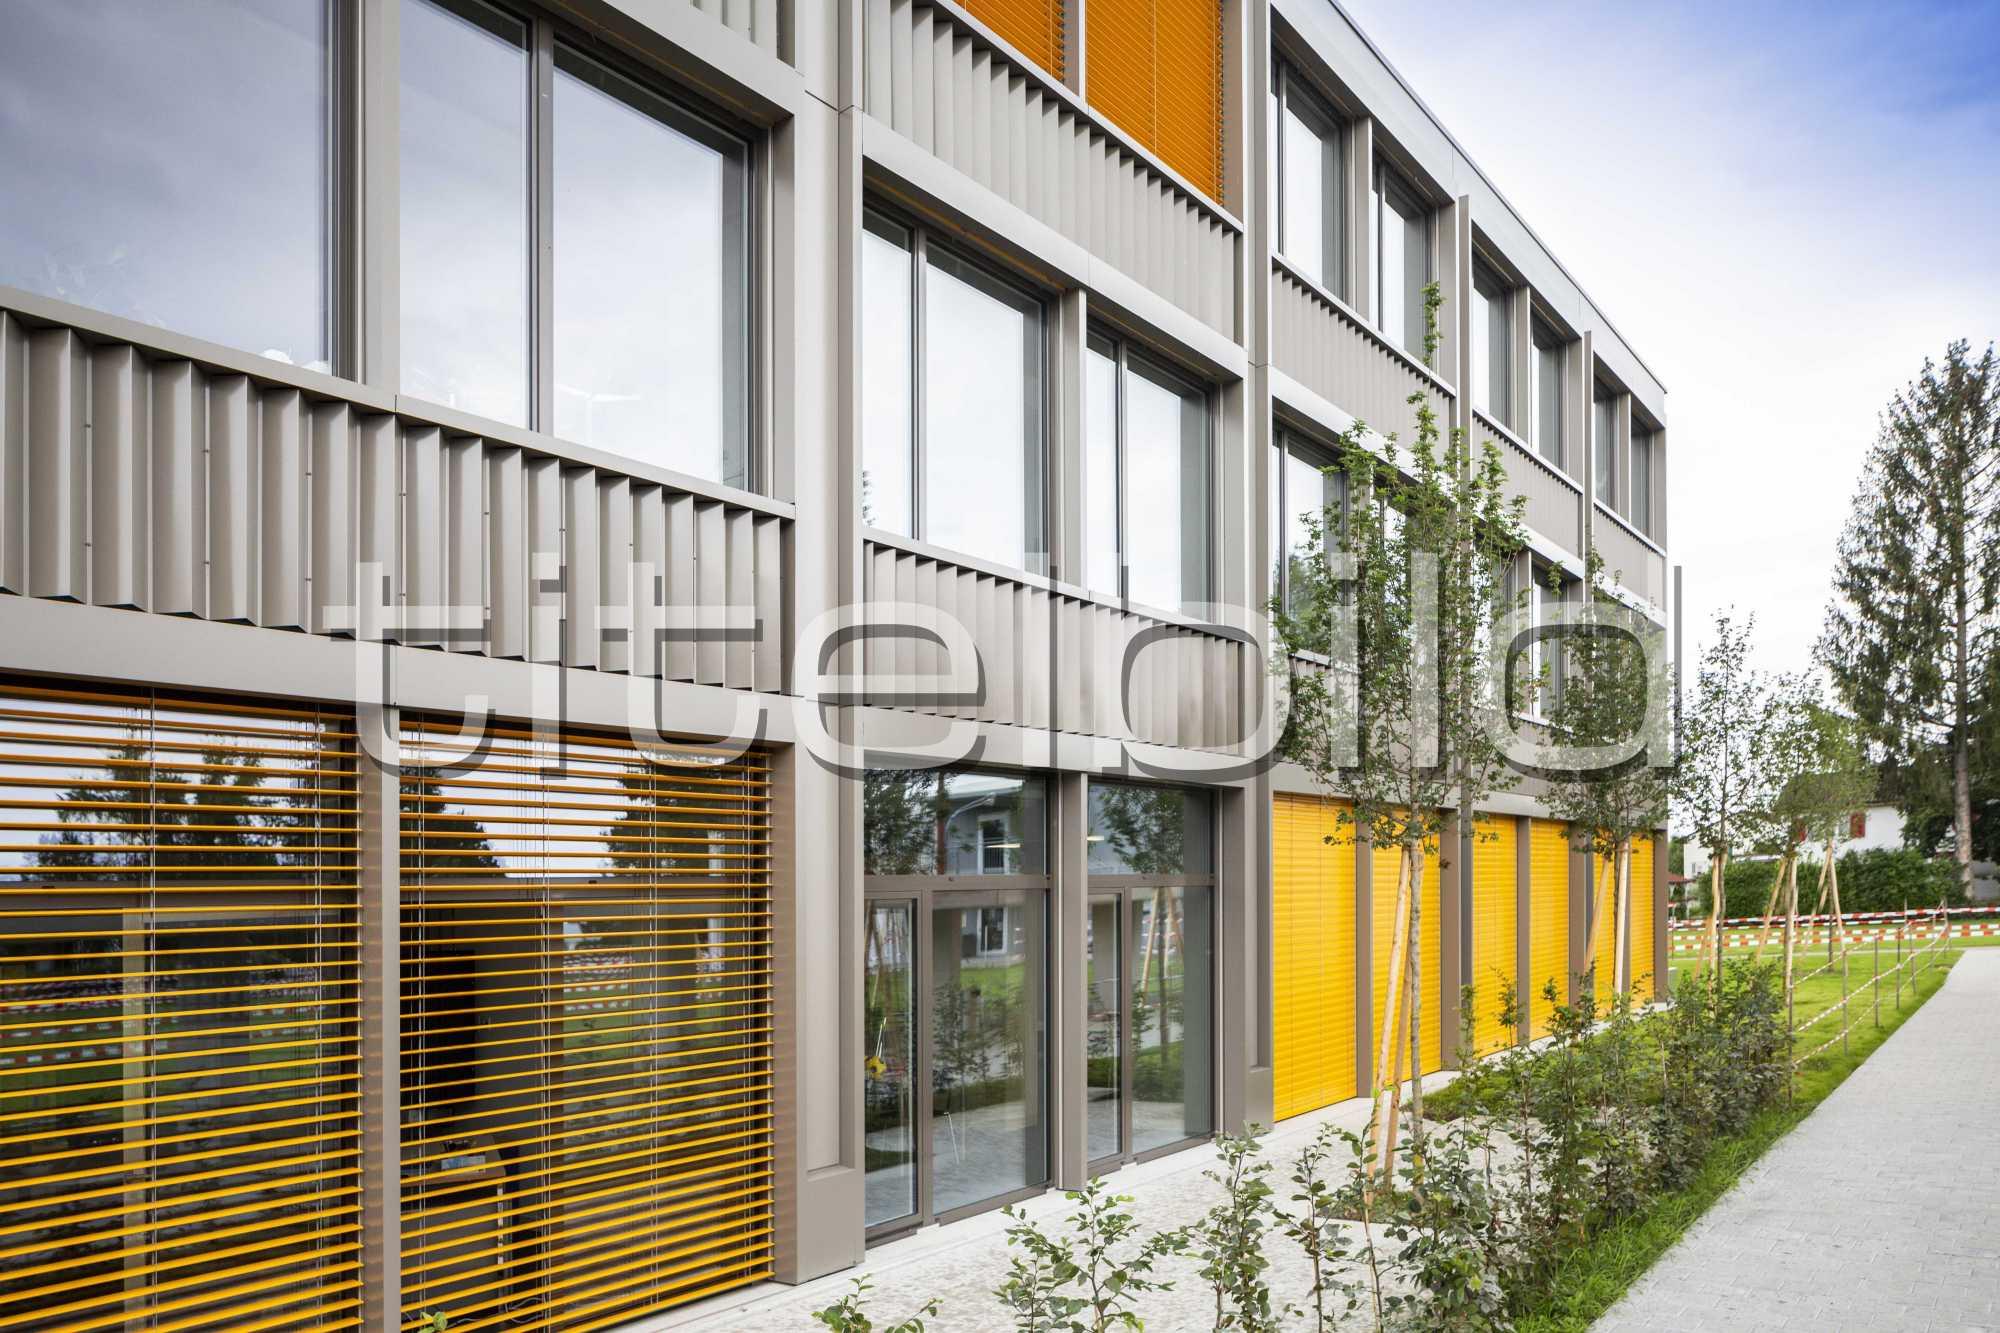 Projektbild-Nr. 4: Erweiterung Primarschule Oberglatt